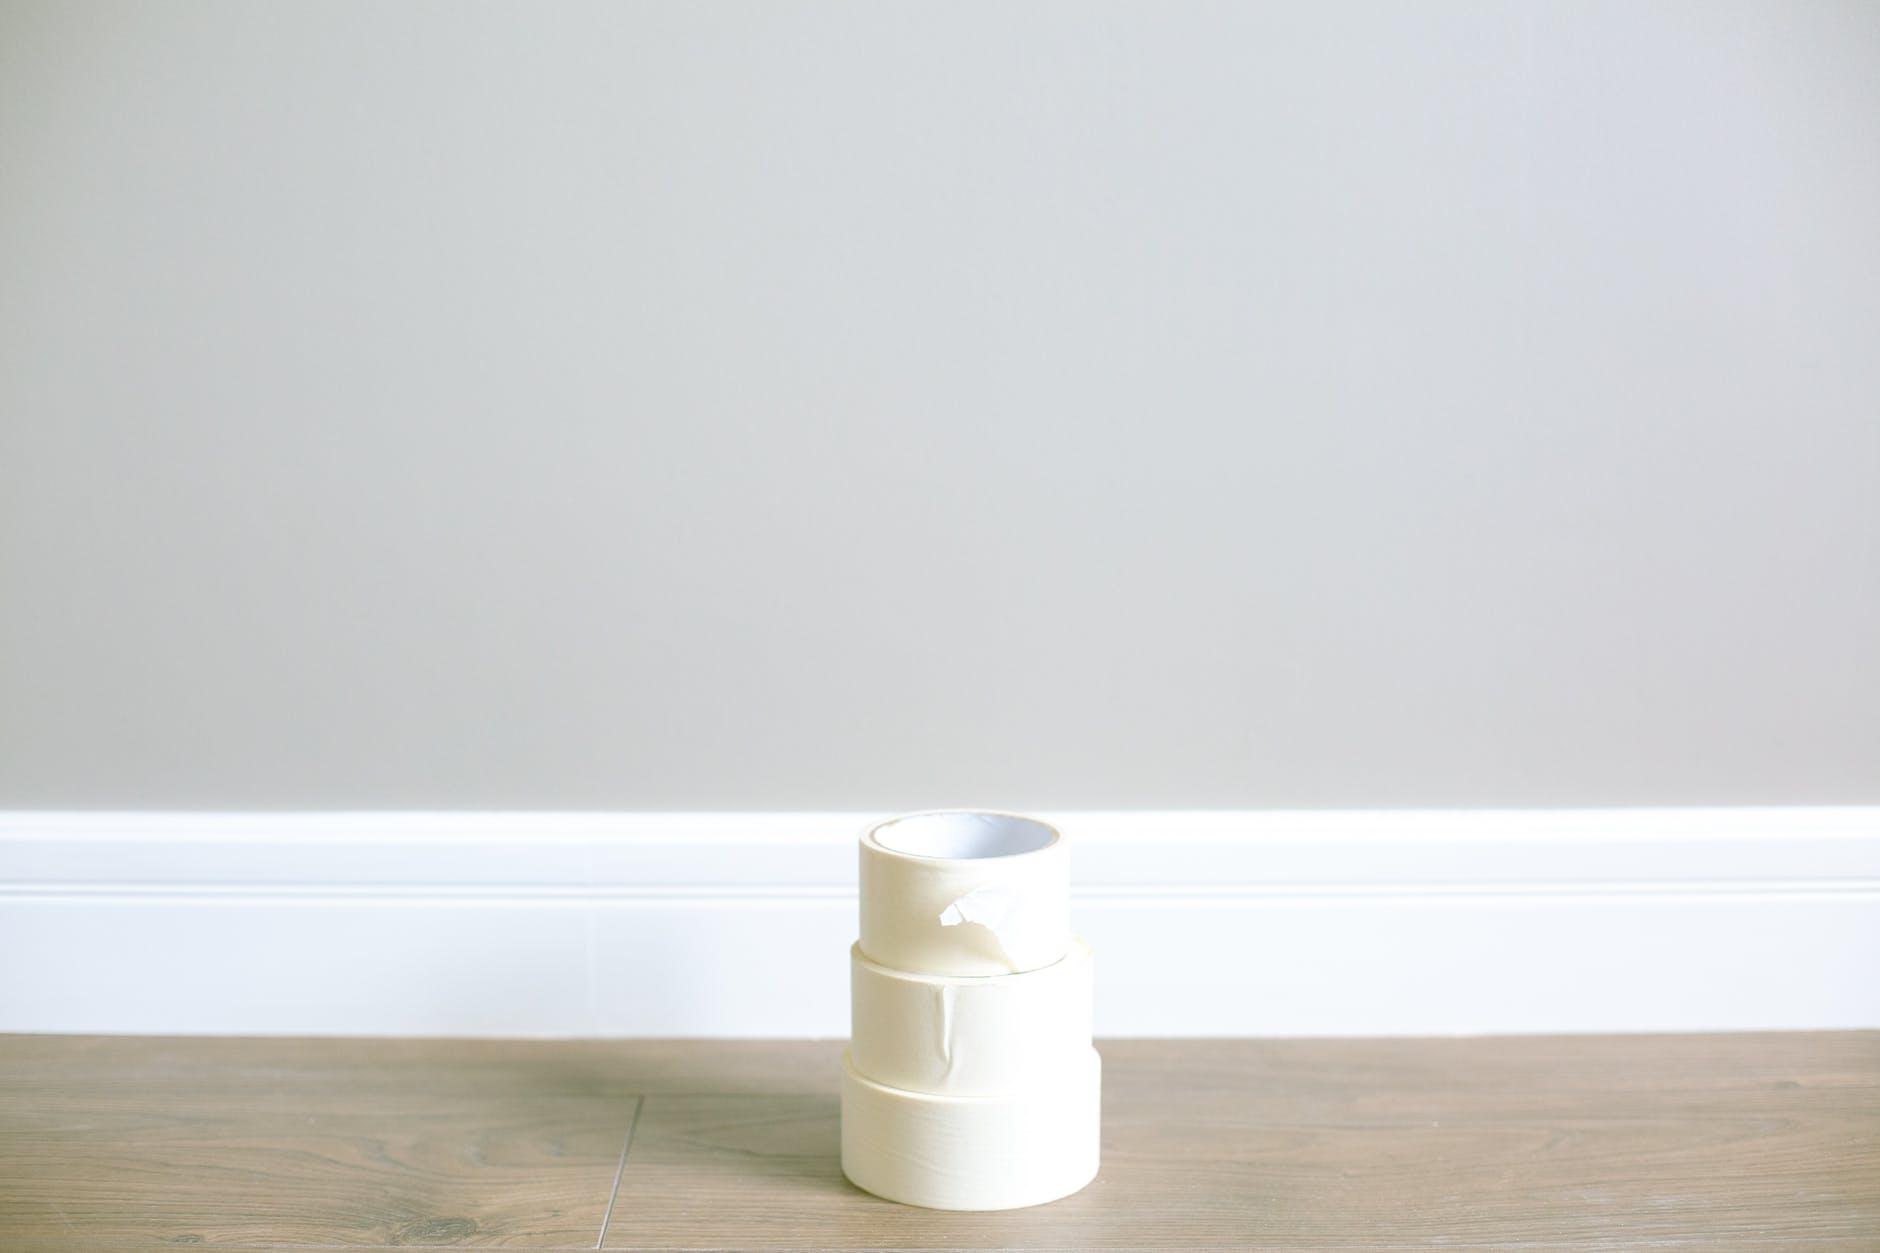 photo of a white masking tape